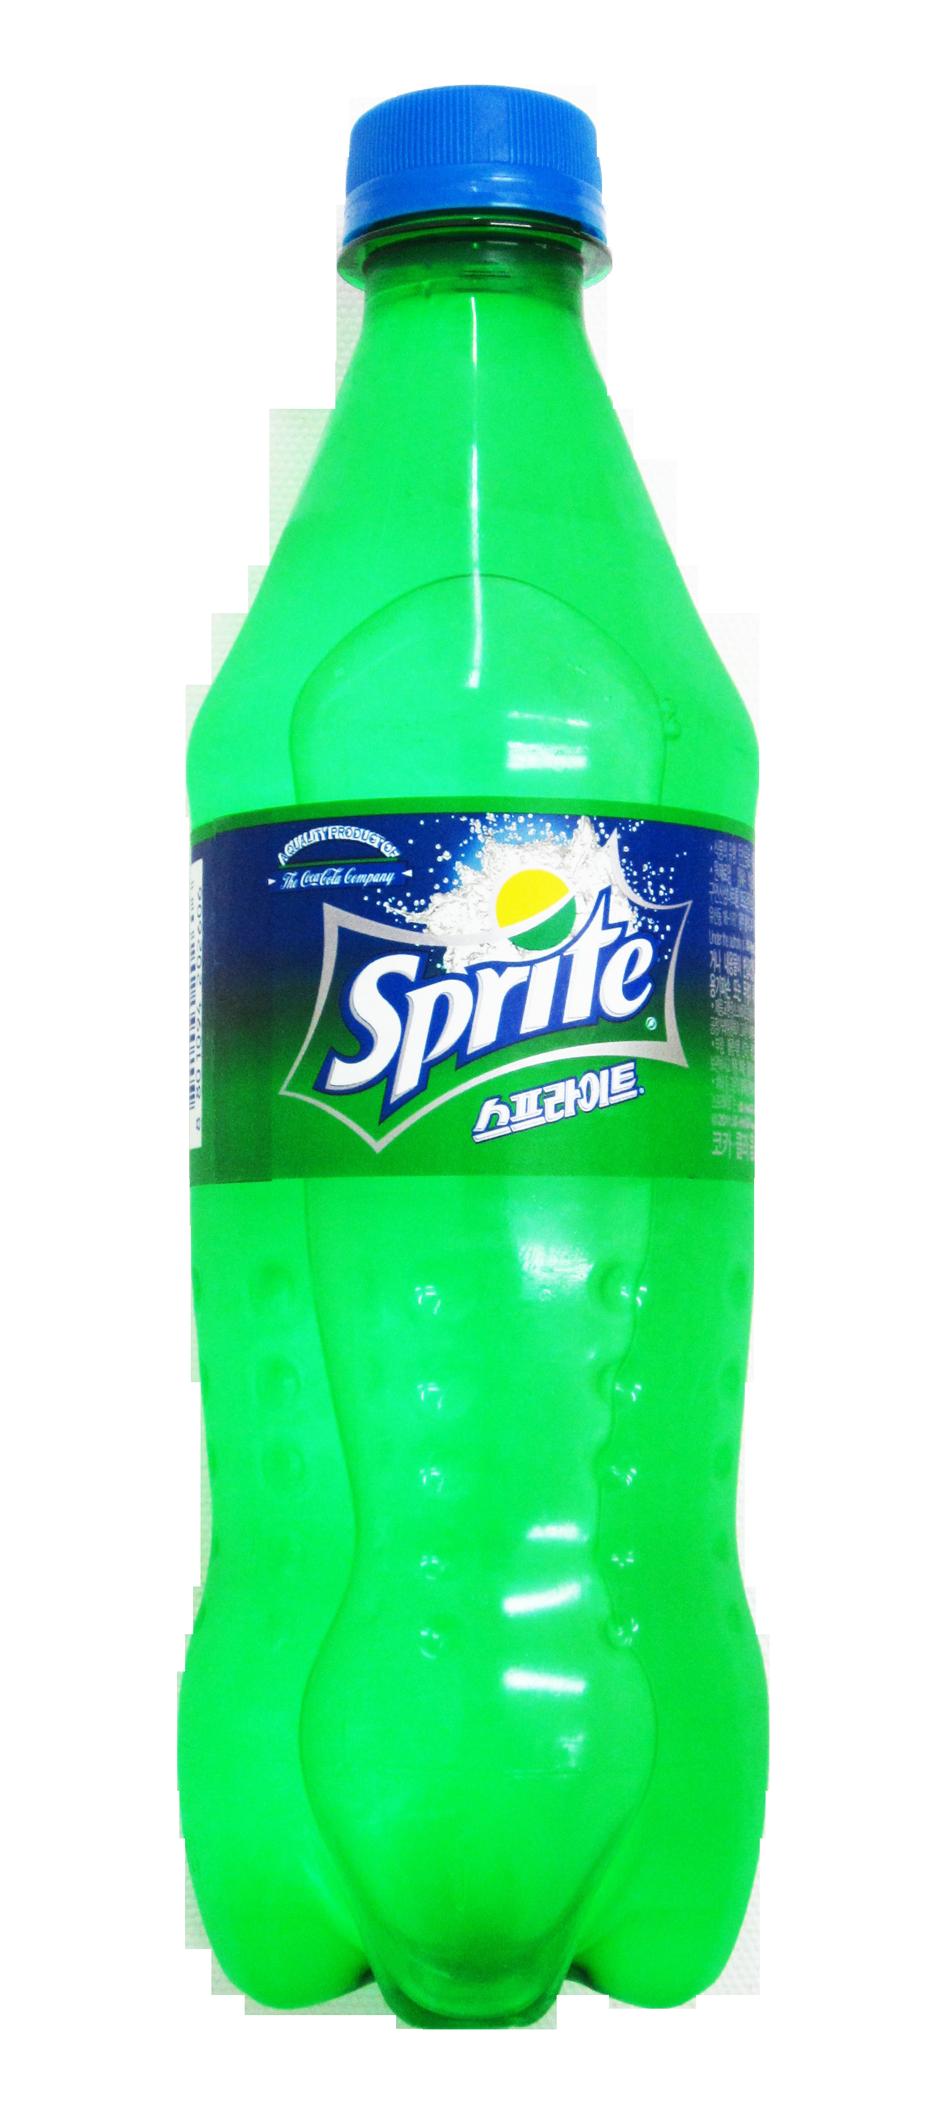 Sprite Bottle Png Image Sprite Bottle Peach